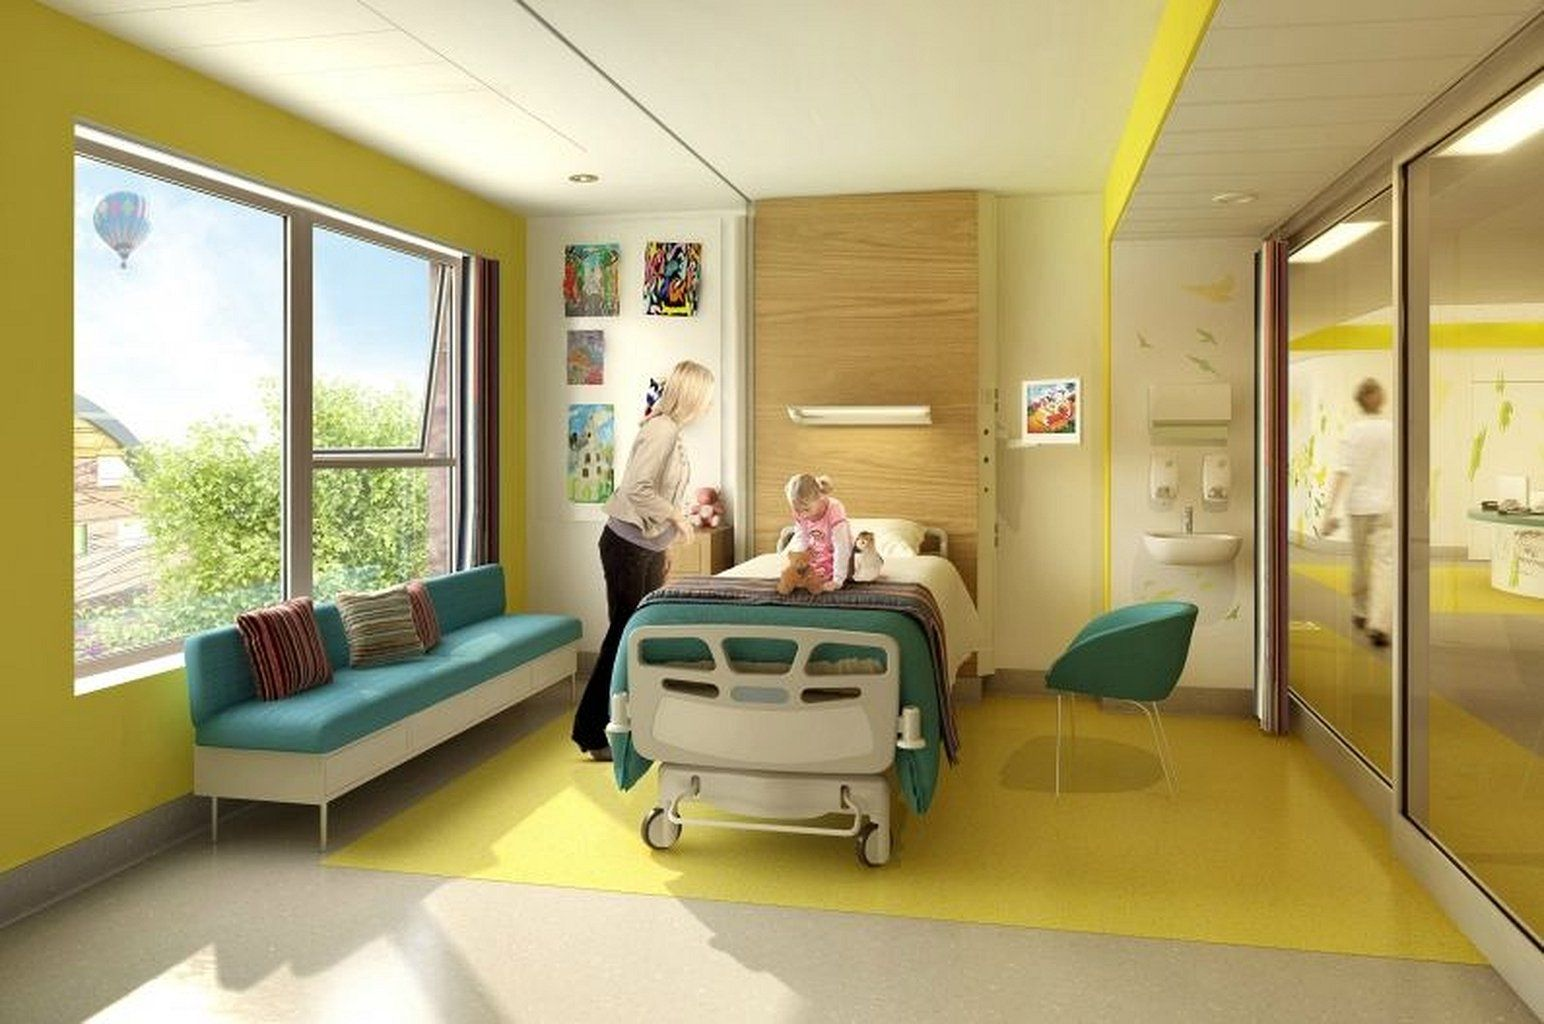 kosair childrens hospital images - HD1525×1000